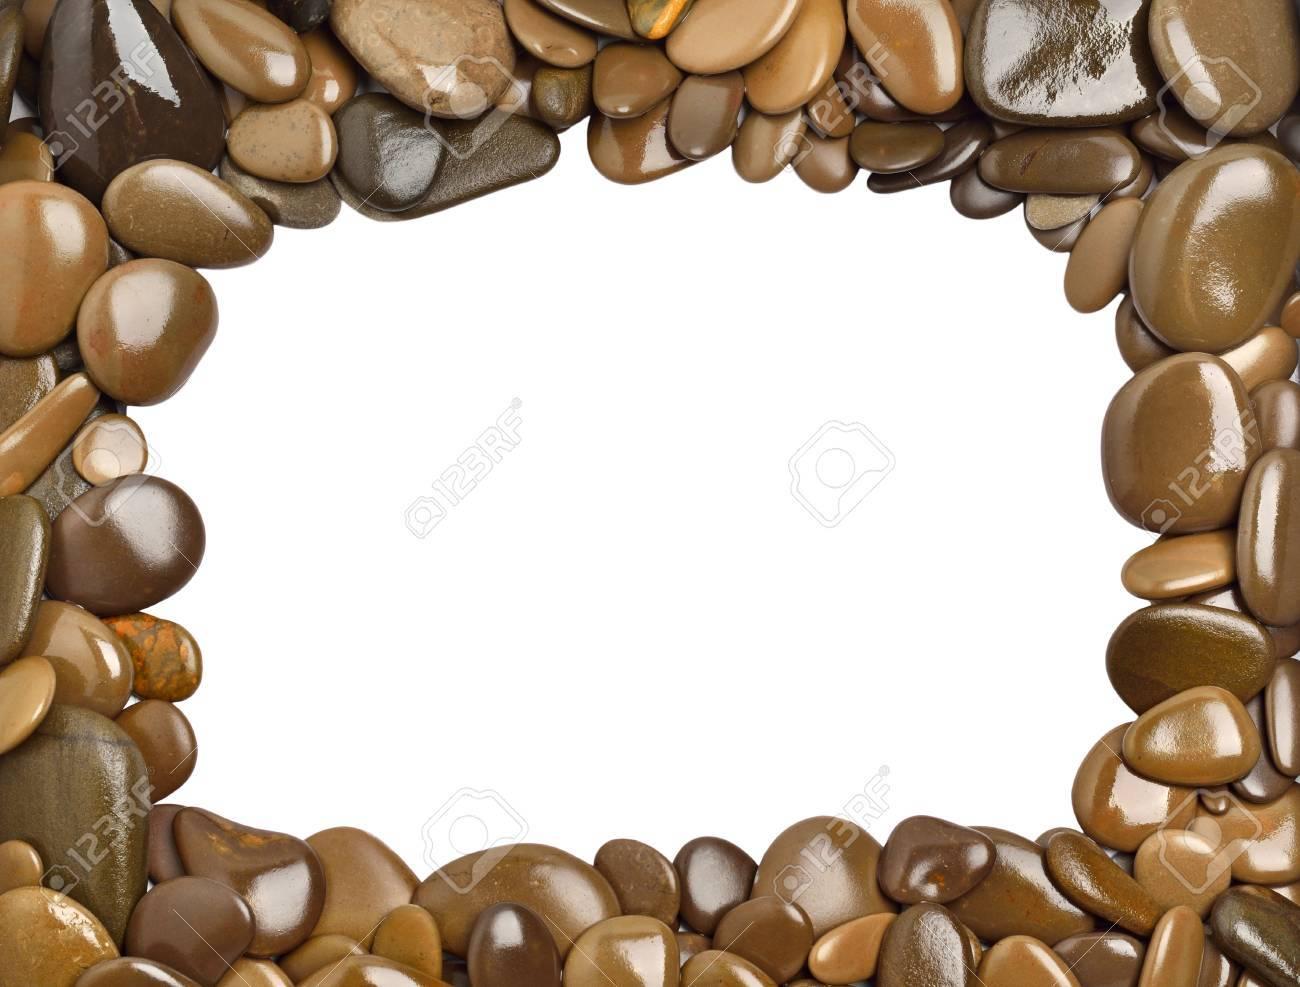 Pebbles frame - 20215047